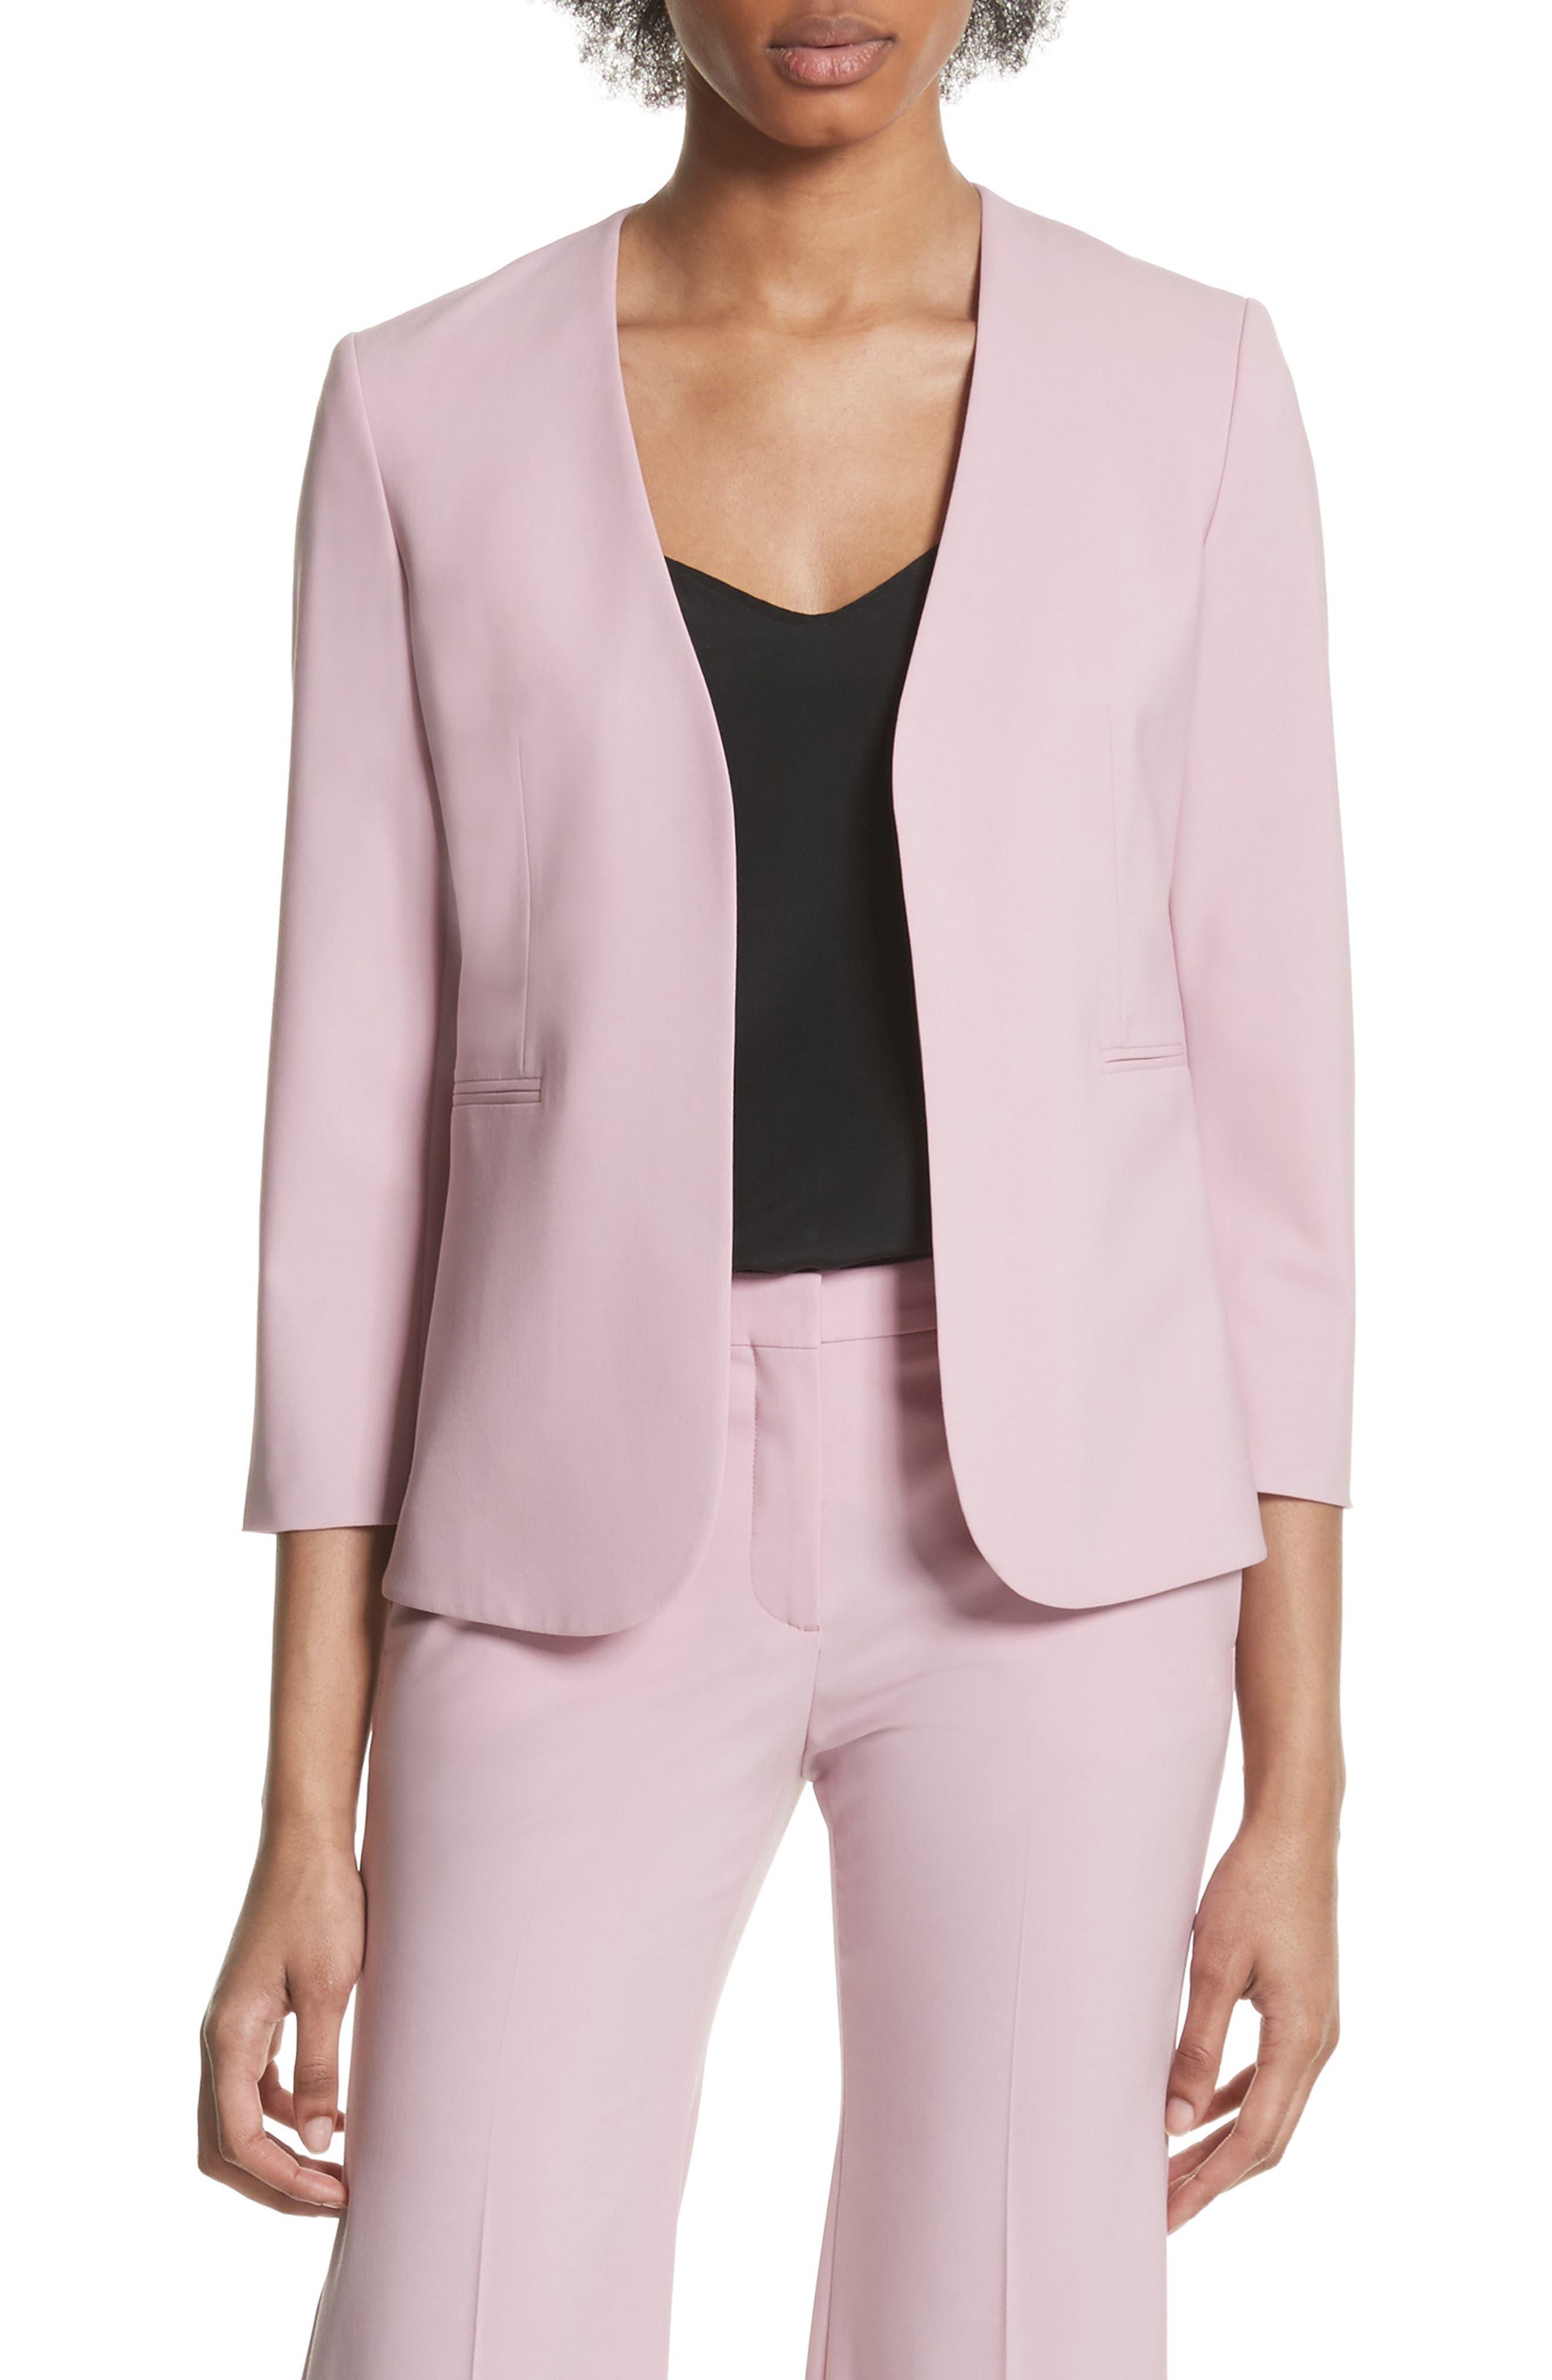 Lindrayia B Good Wool Suit Jacket,                             Main thumbnail 1, color,                             Berry Tint